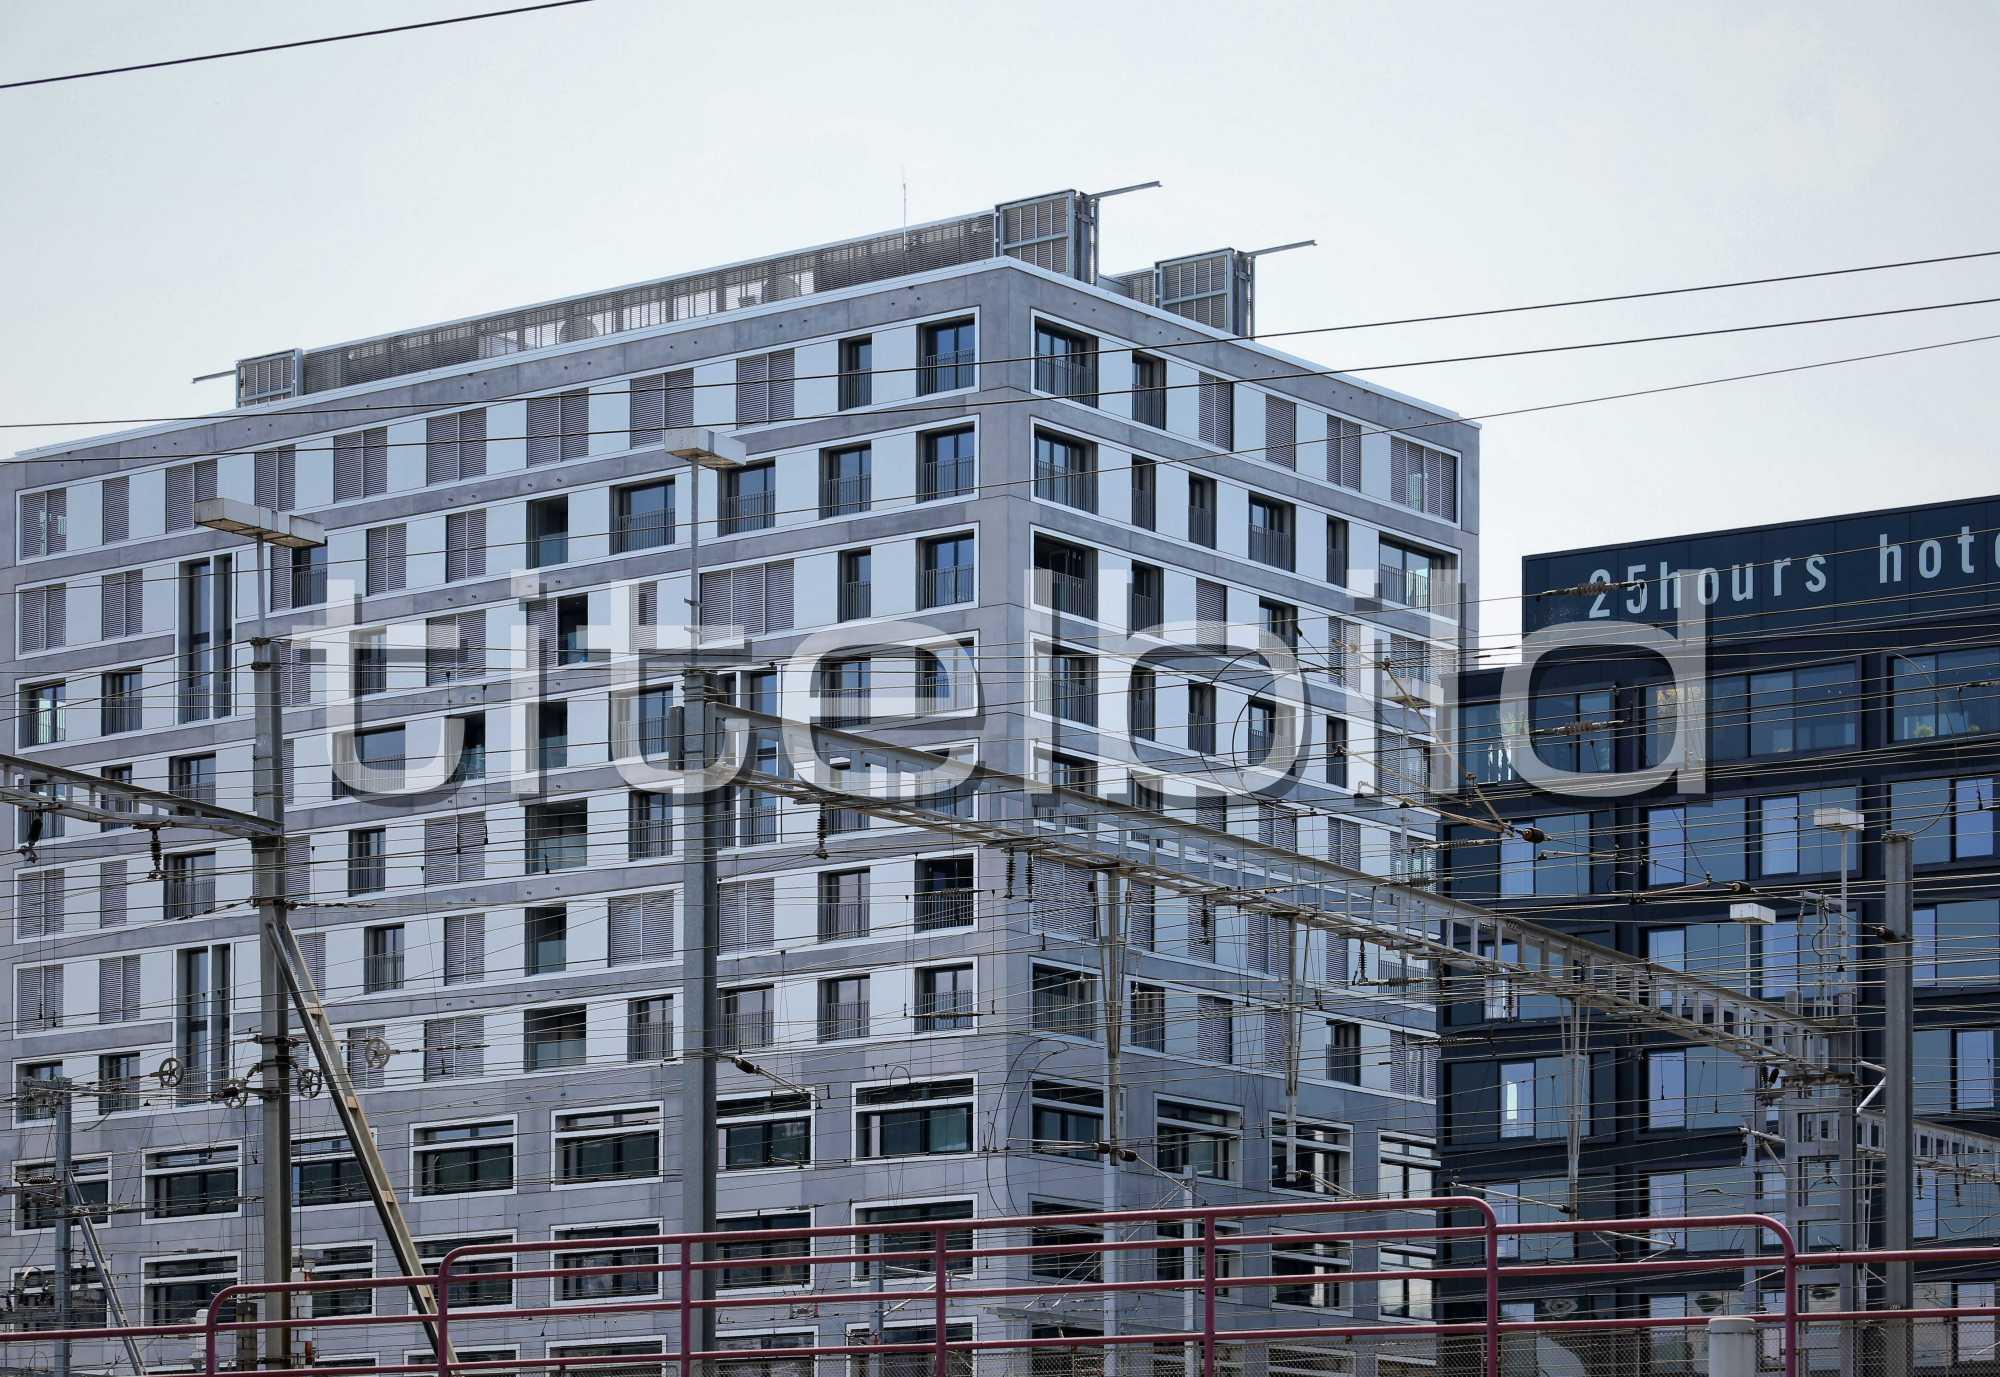 Projektbild-Nr. 6: Europaallee Haus H, 25hours hotel, GUSTAV Residenz